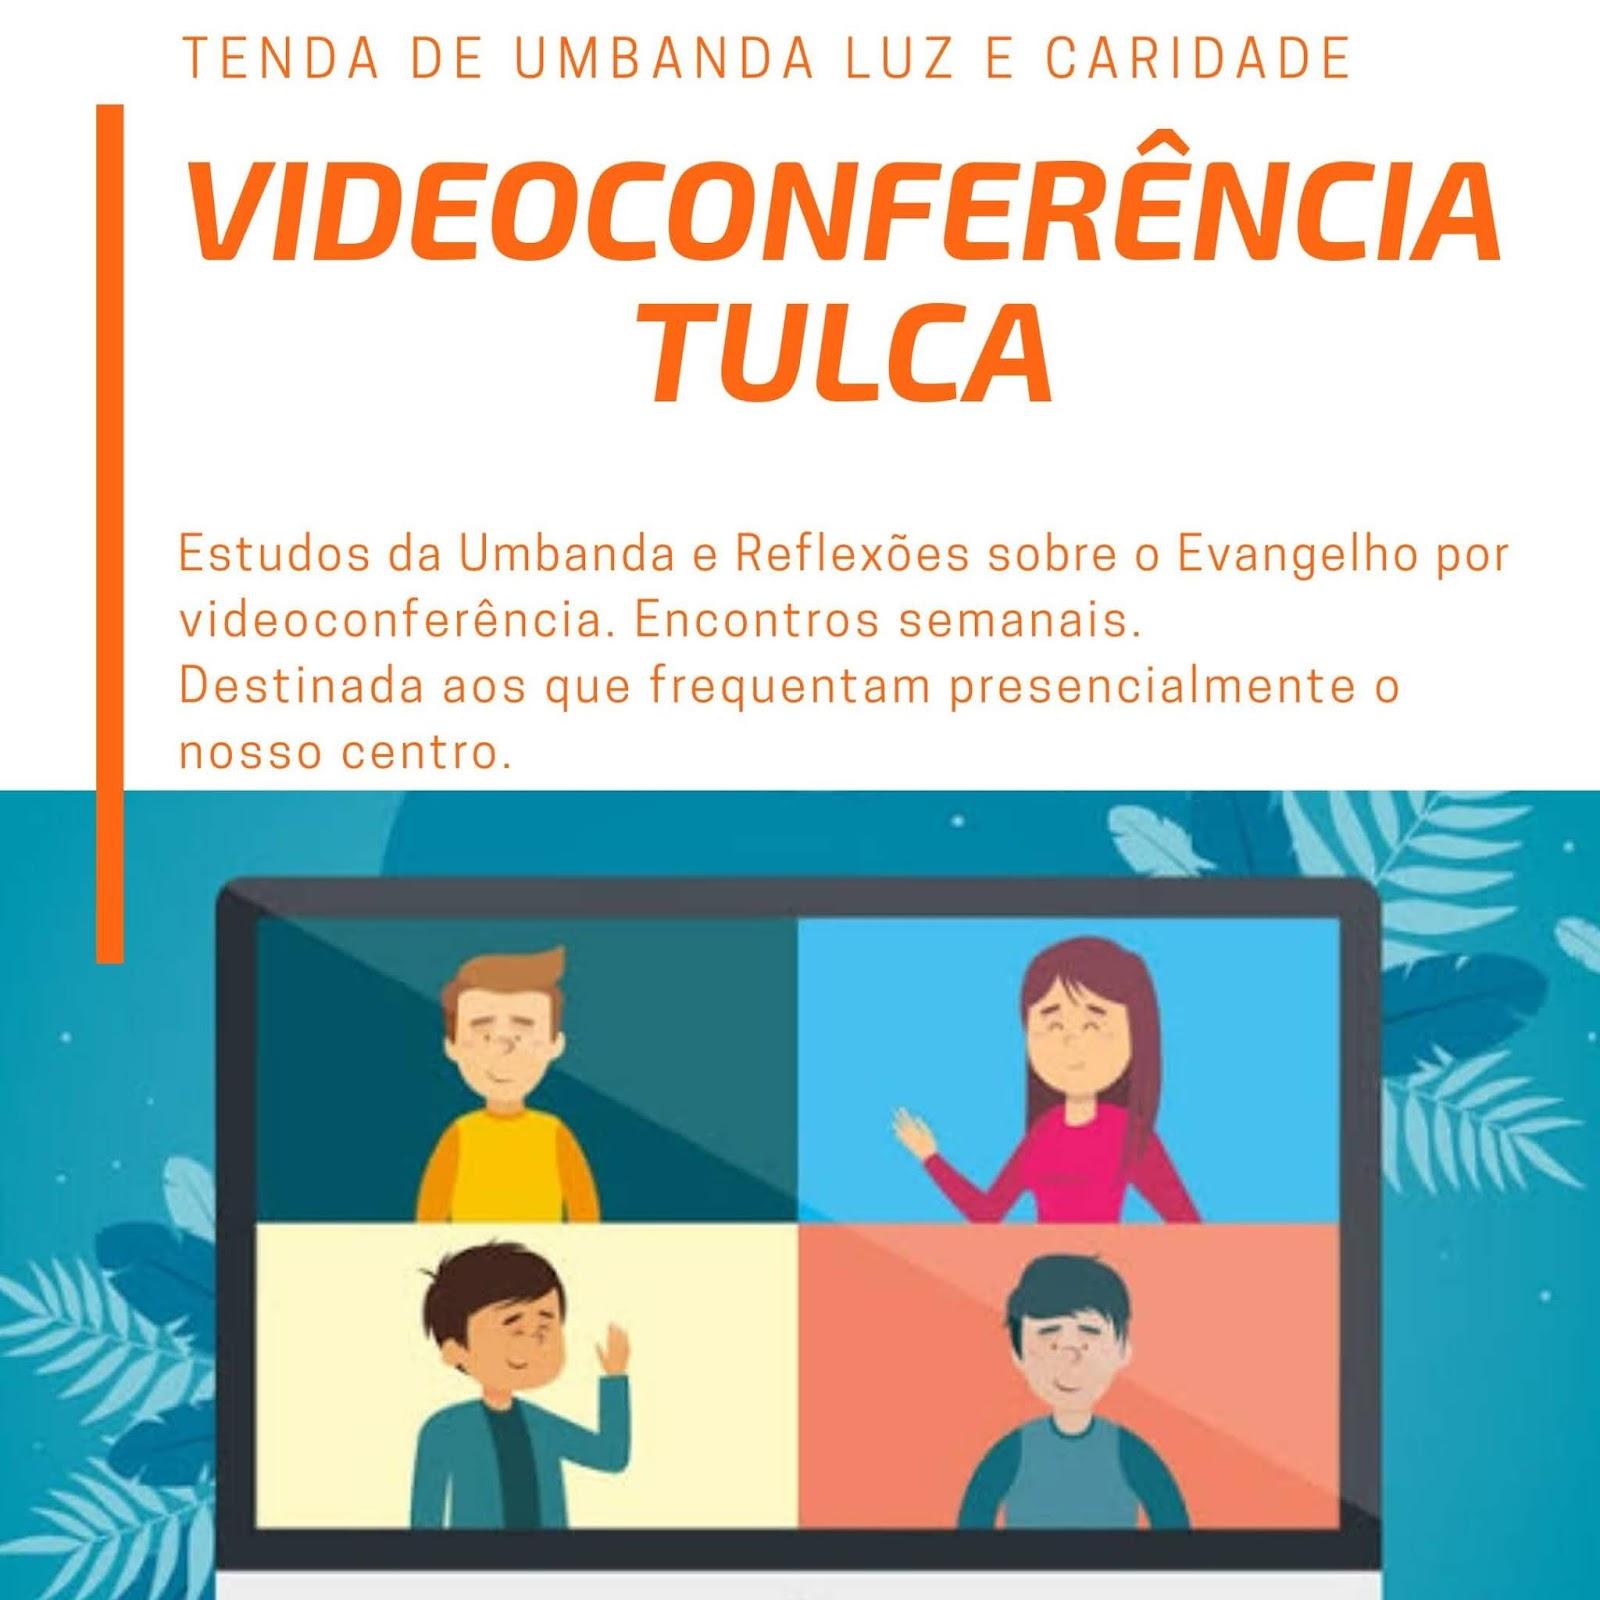 Videoconferência Tulca